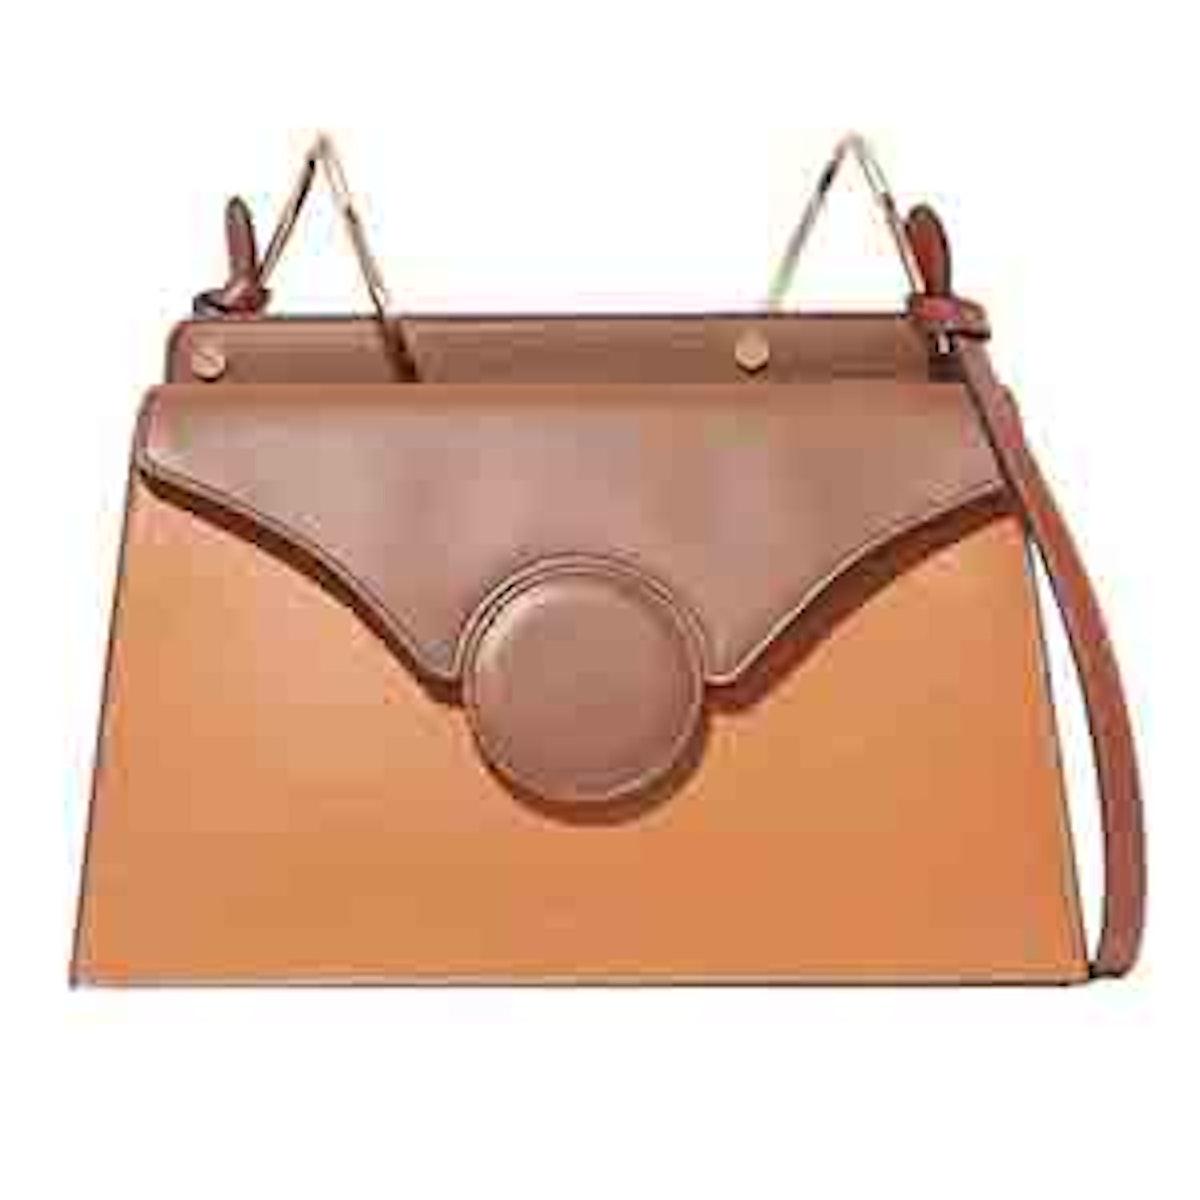 Phoebe Two-Tone Leather Shoulder Bag